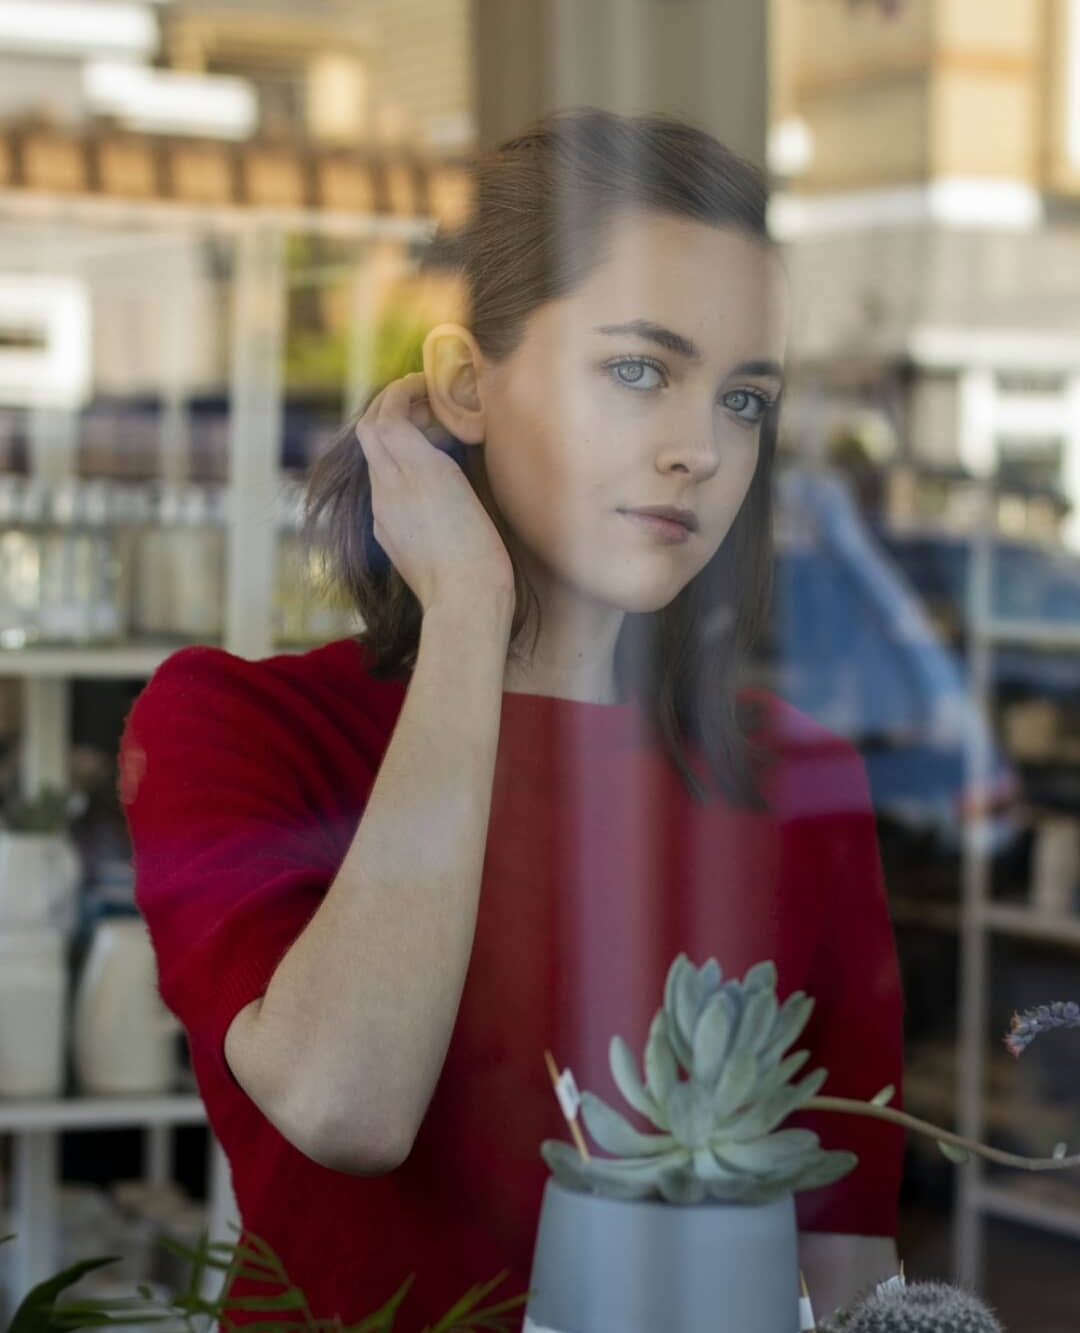 Window Shopping by Jasmine Evans